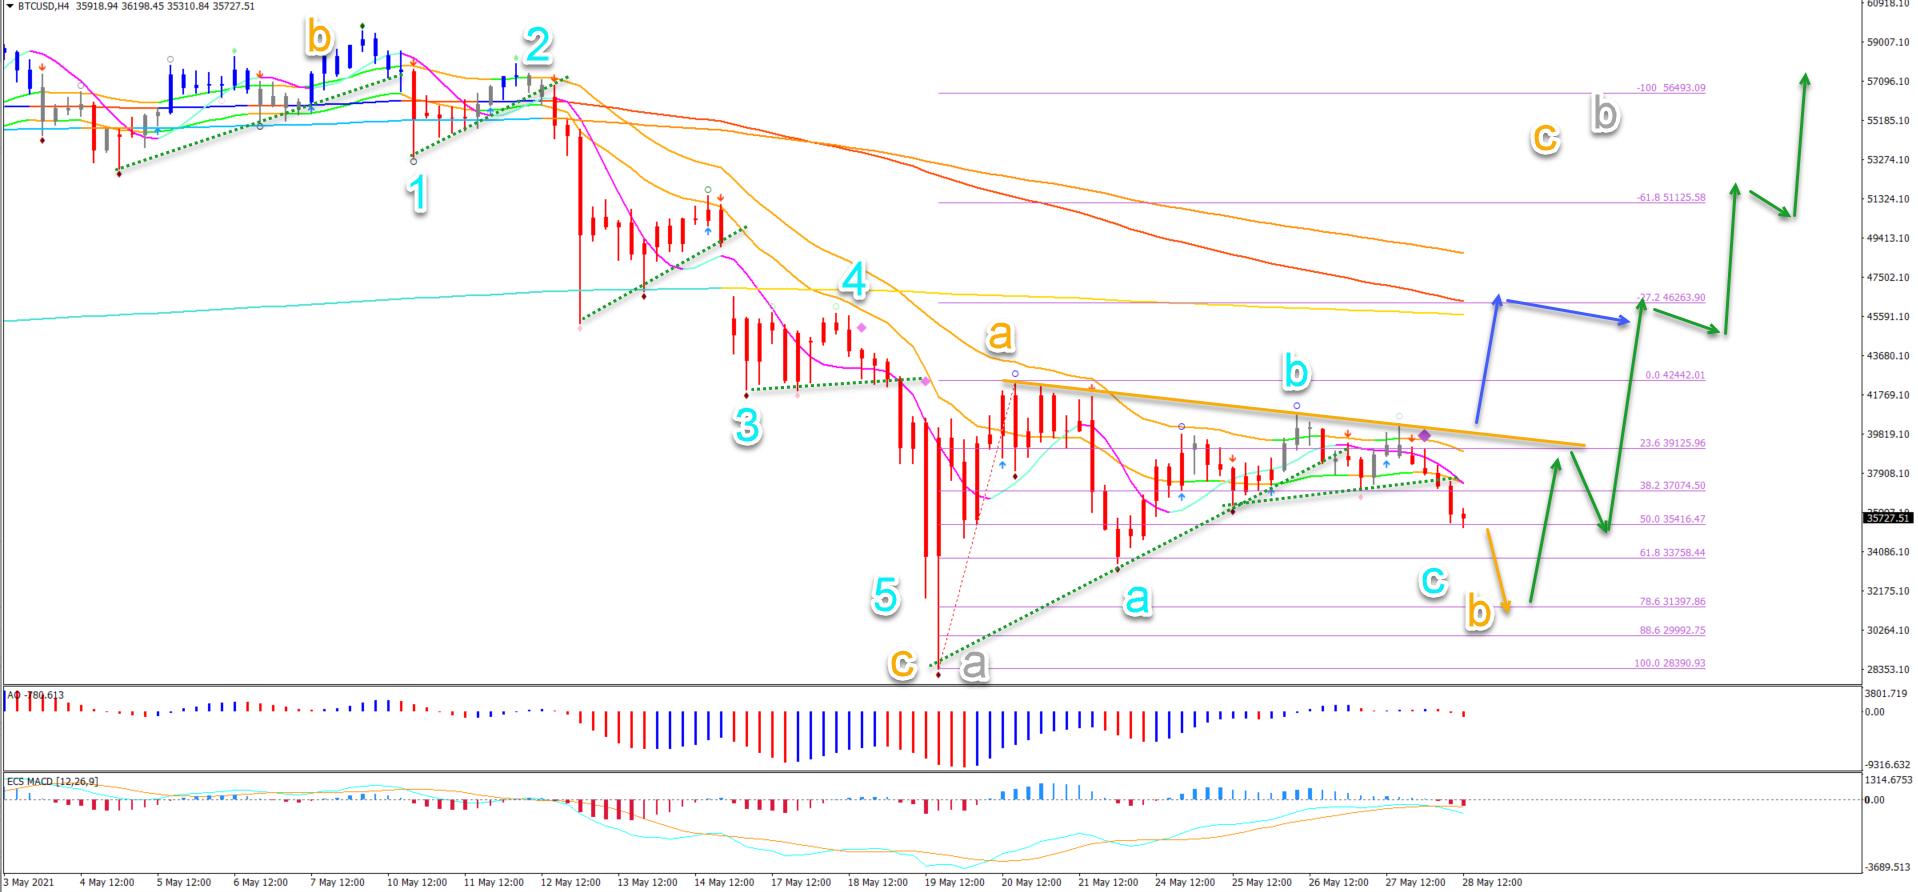 BTC/USD 28.5.2021 4 hour chart